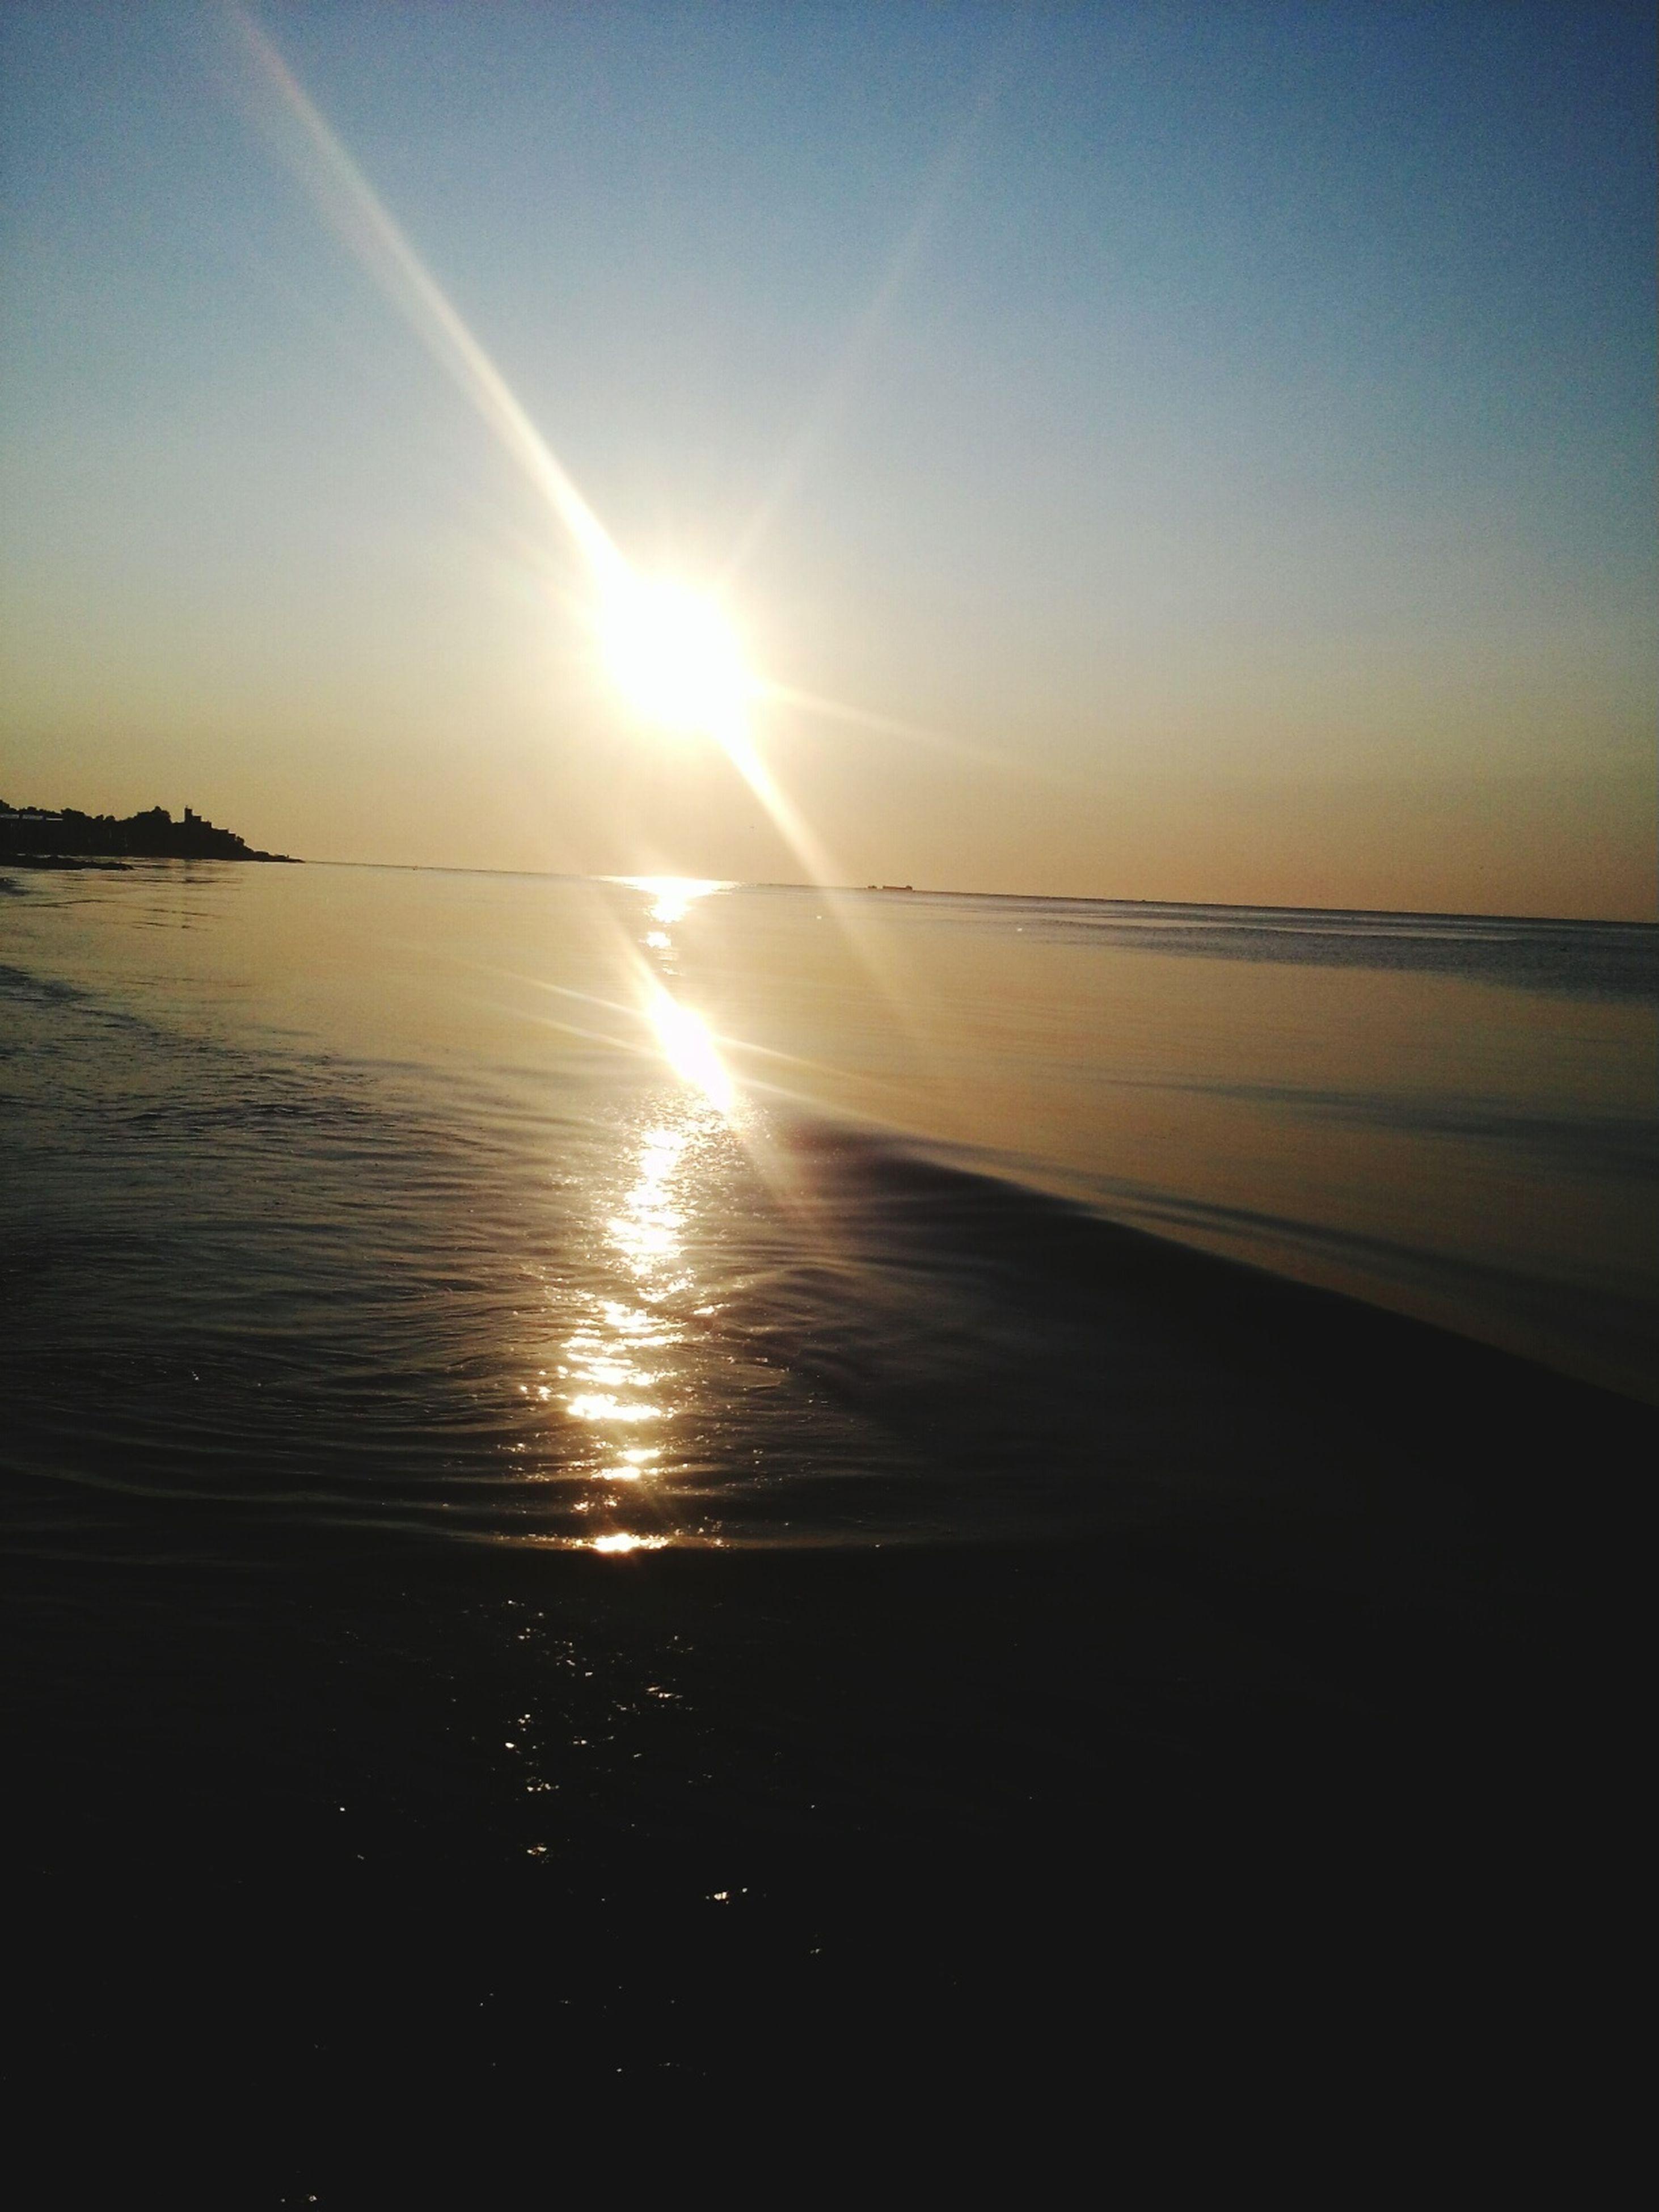 sea, water, horizon over water, sun, beach, tranquil scene, scenics, sunset, tranquility, beauty in nature, shore, reflection, sunlight, sky, nature, idyllic, sunbeam, sand, clear sky, outdoors